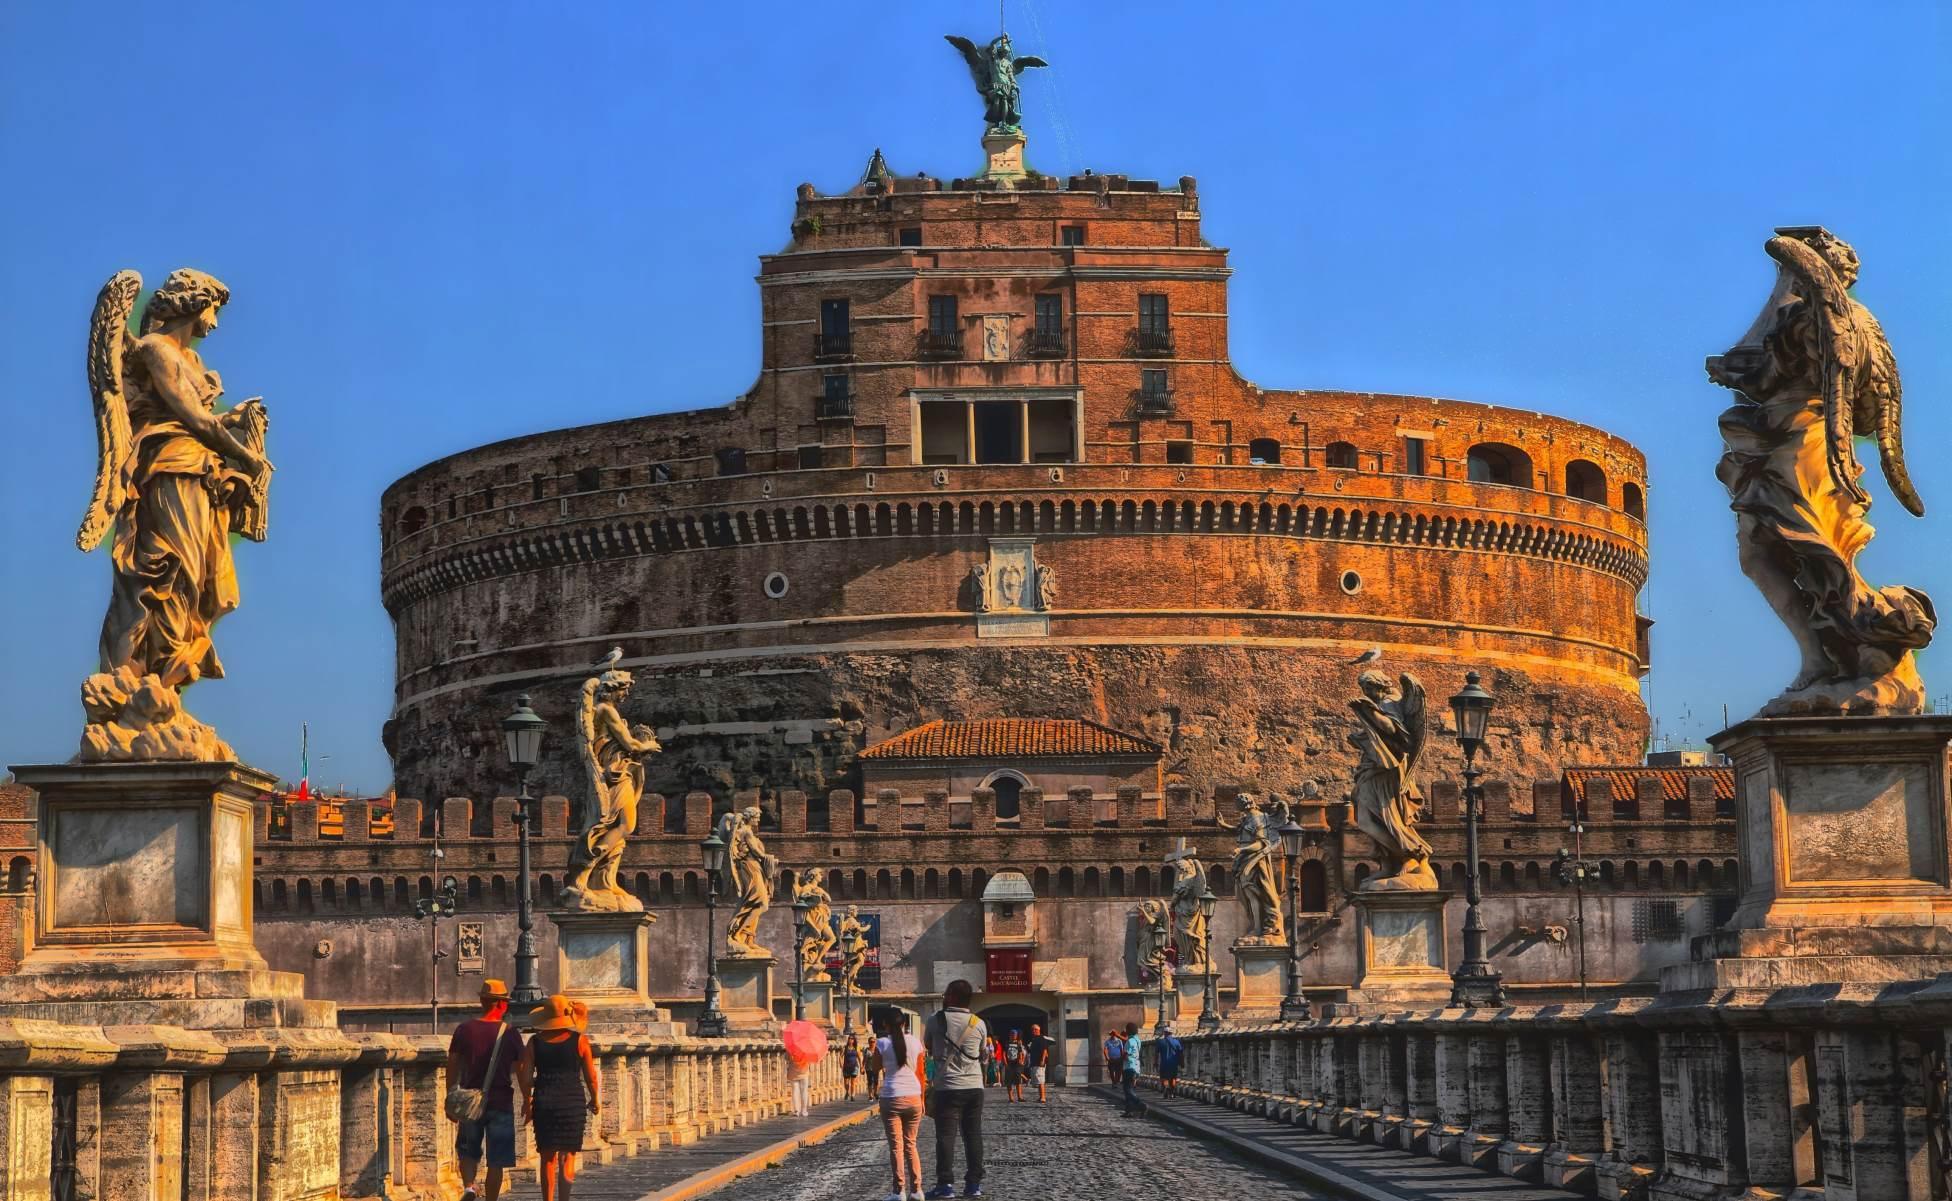 consejos para viajar a roma 2